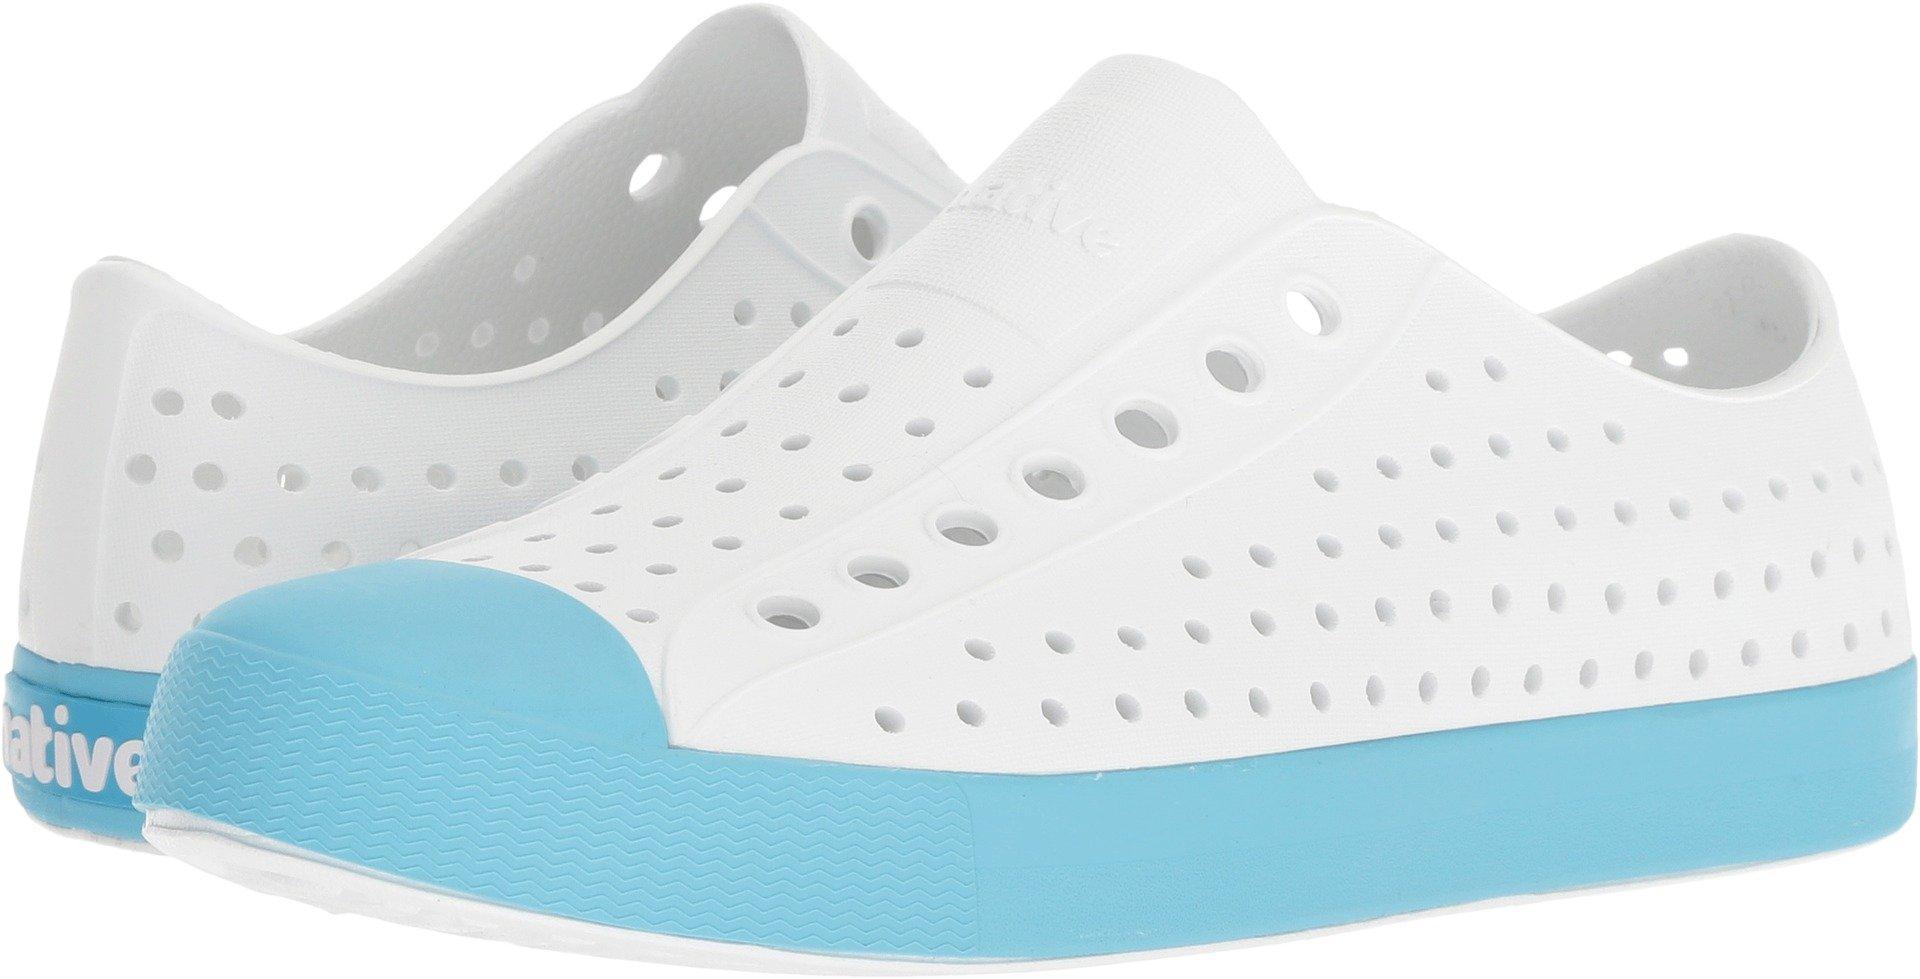 Native Shoes Jefferson Water Shoe, Shell White/Surfer Blue, 3 Men's (5 B US Women's) M US